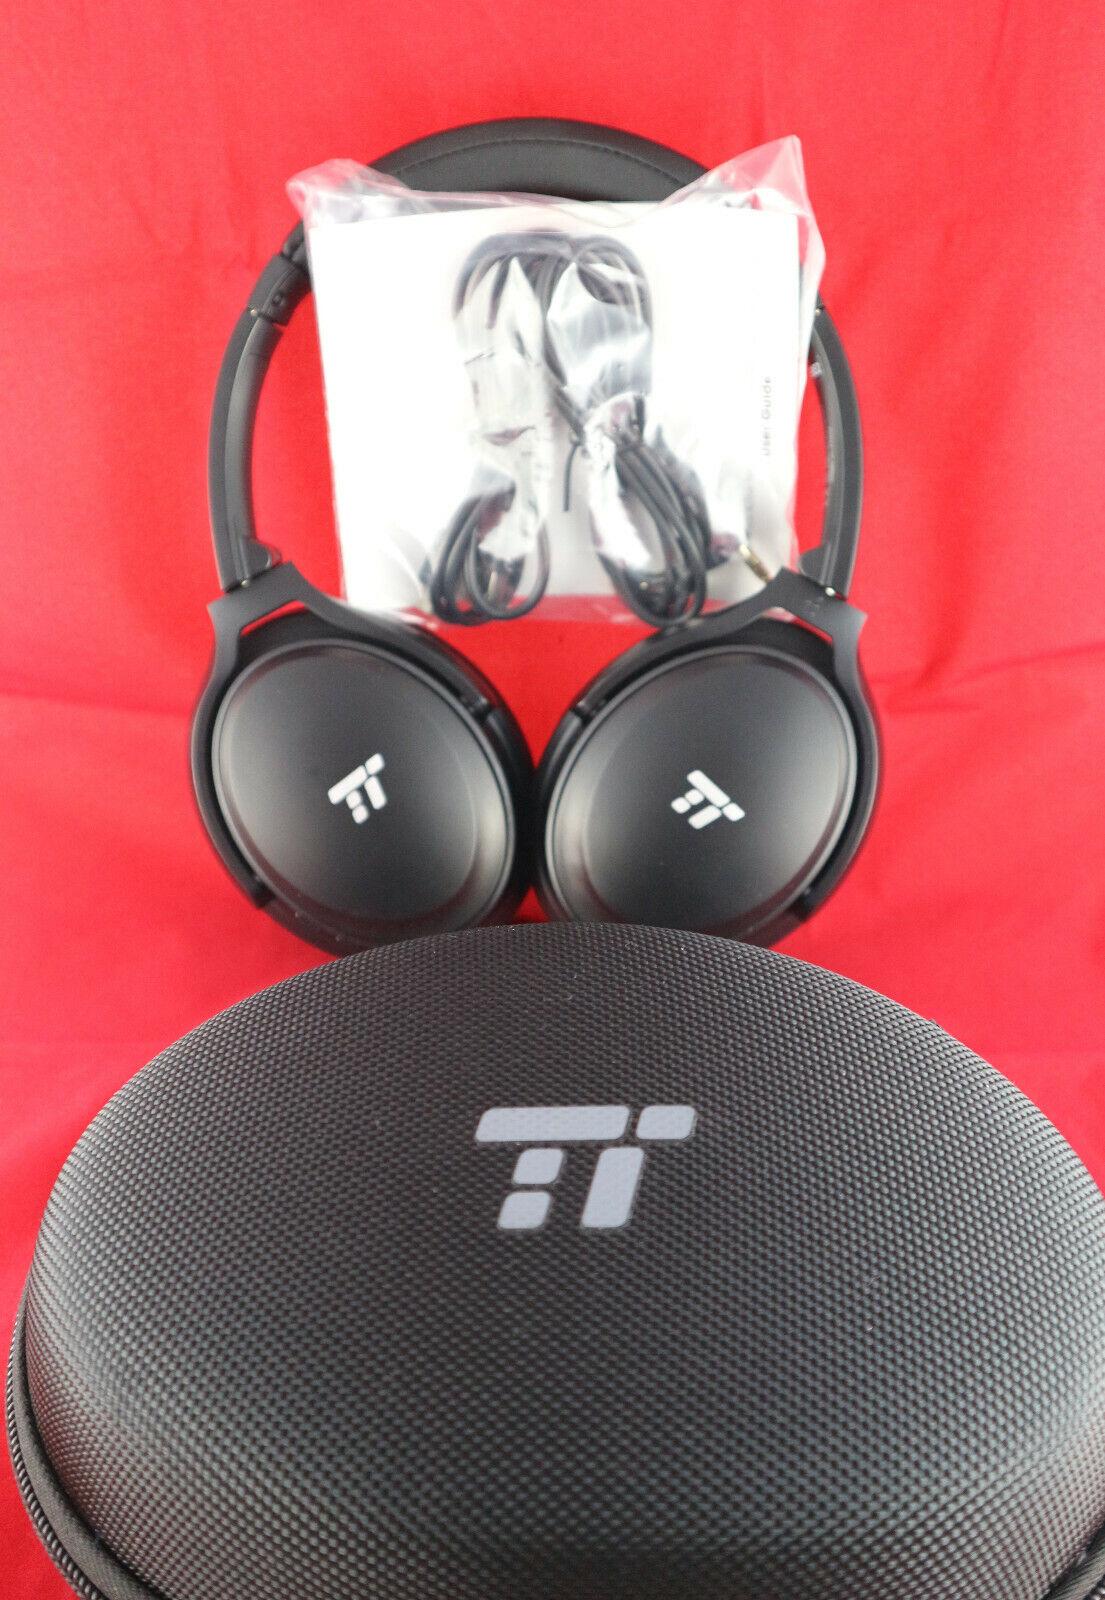 TaoTronics TT-BH22 Aktive Geräuschunterdrückung ,, Bluetooth-Headset, Over Ear,